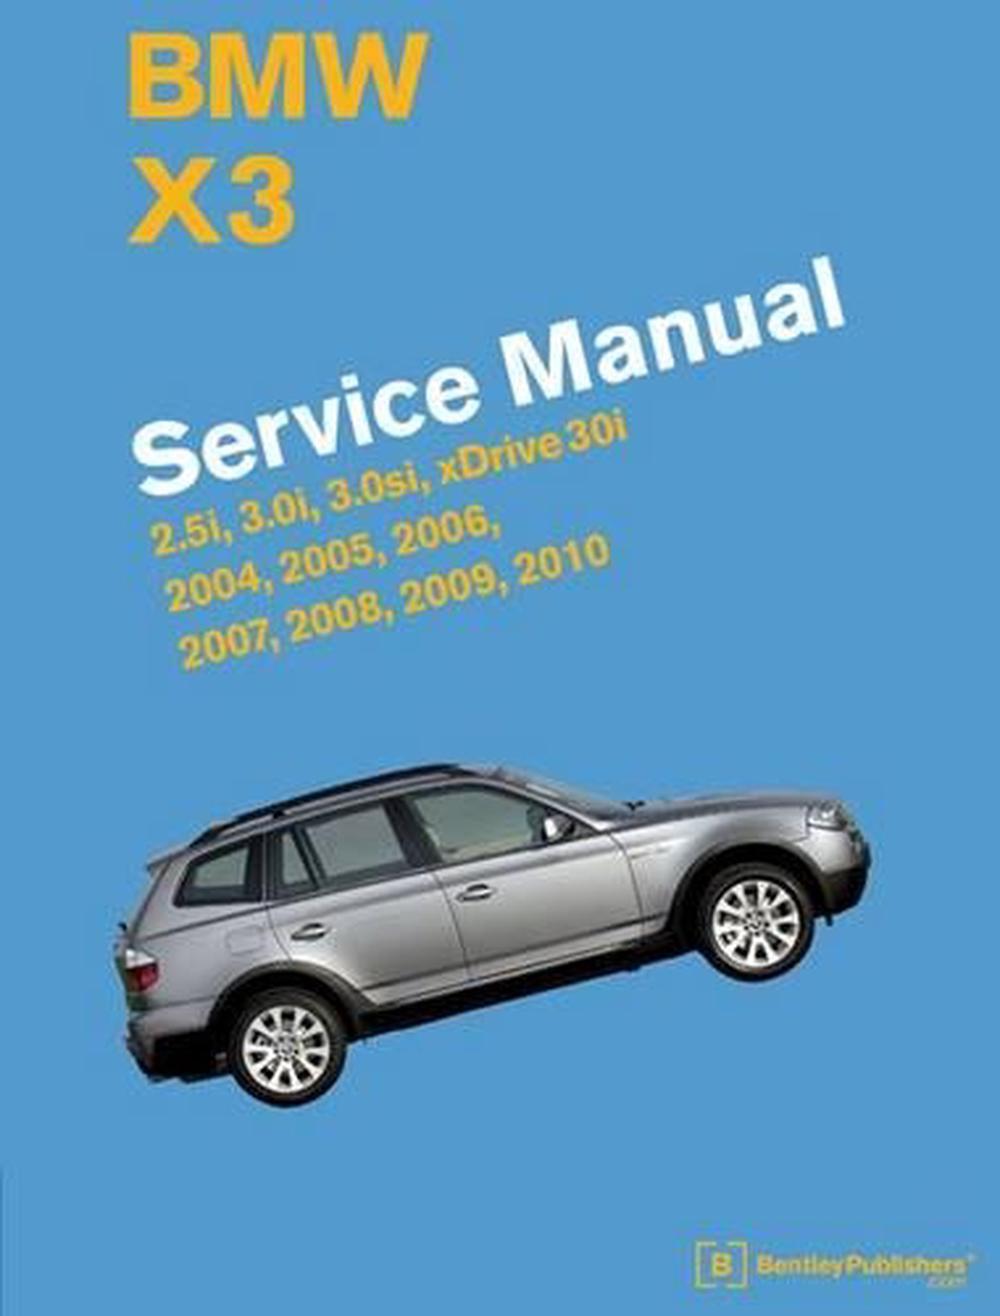 BMW X3 (E83) Service Manual: 2004, 2005, 2006, 2007, 2008, 2009, 2010:  2.5i, 3.0i, 3.0si, Xdrive 30i